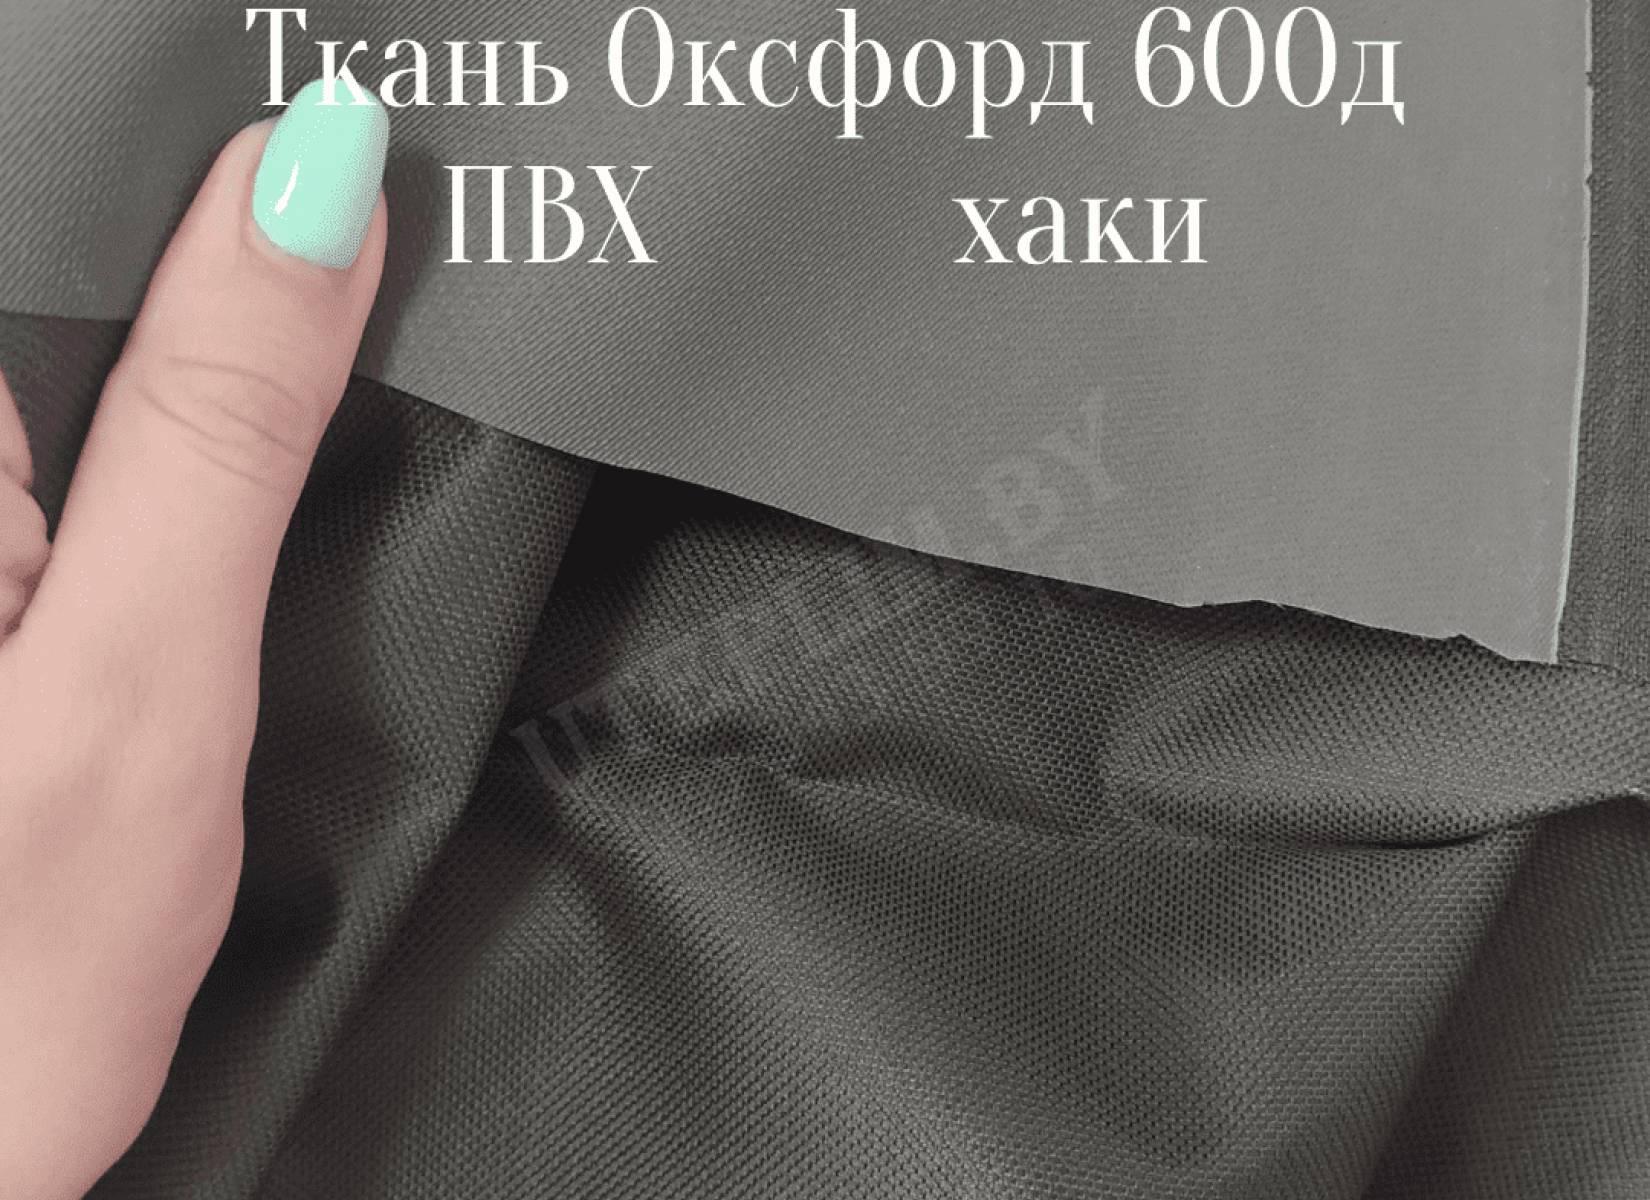 600д ПВХ - хаки